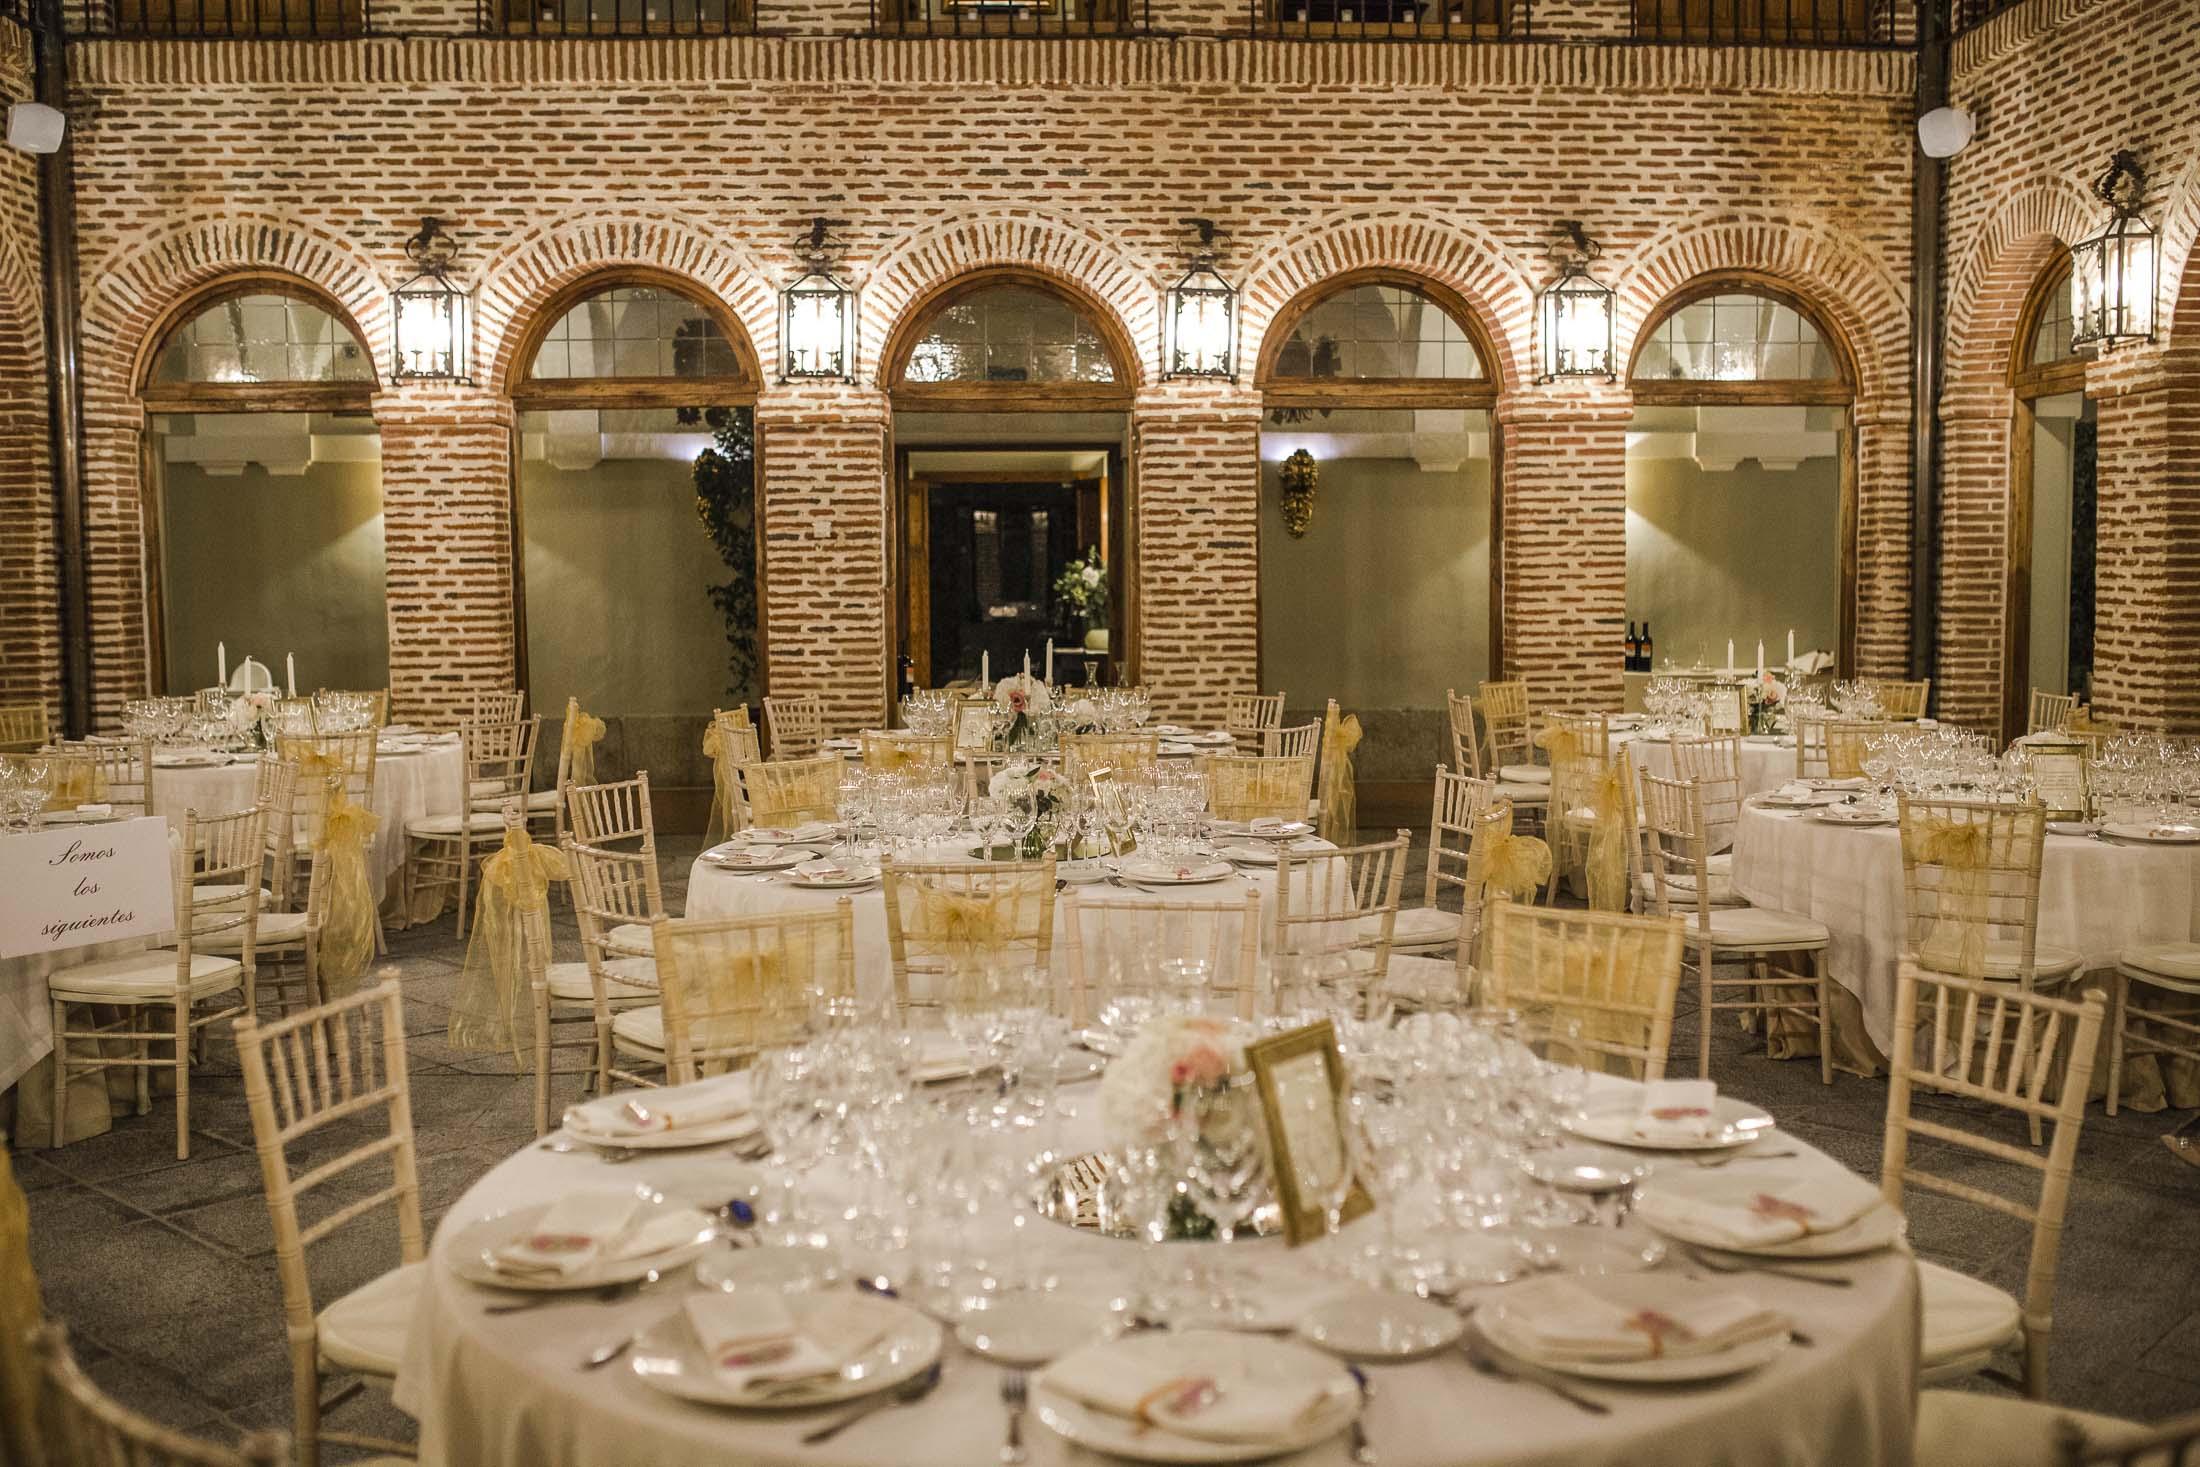 decoración mesas cena boda convento boadilla